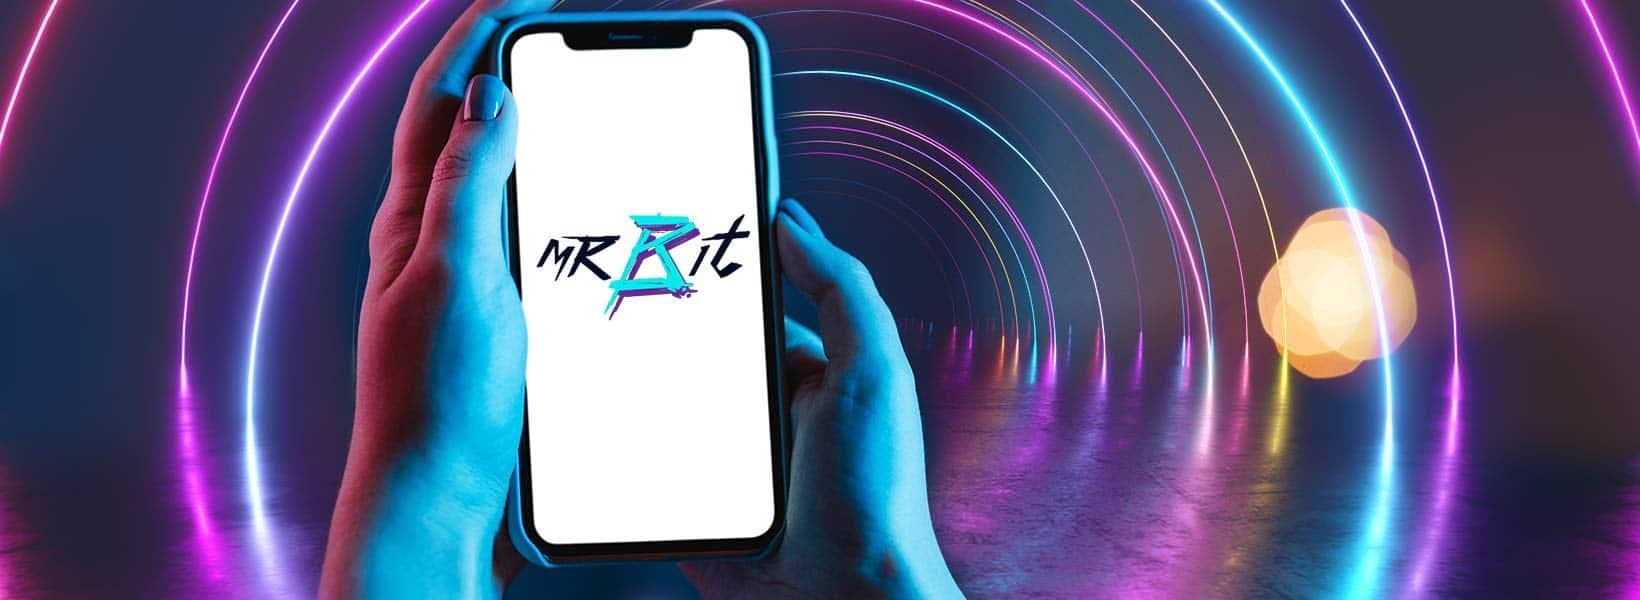 mr bit mobile